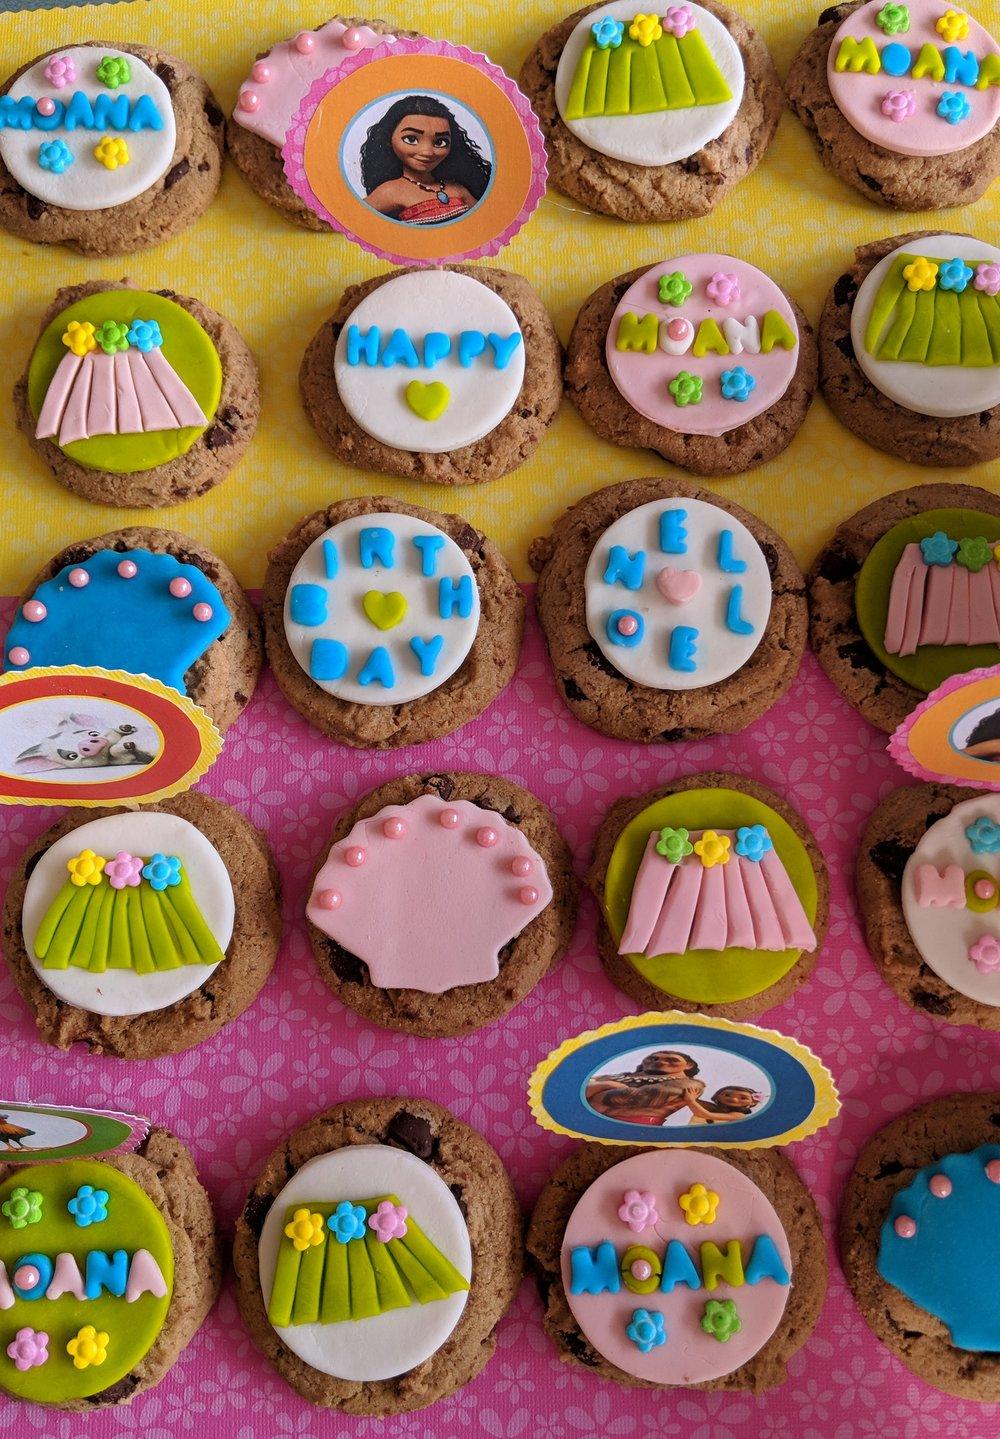 Moana cookies.jpg